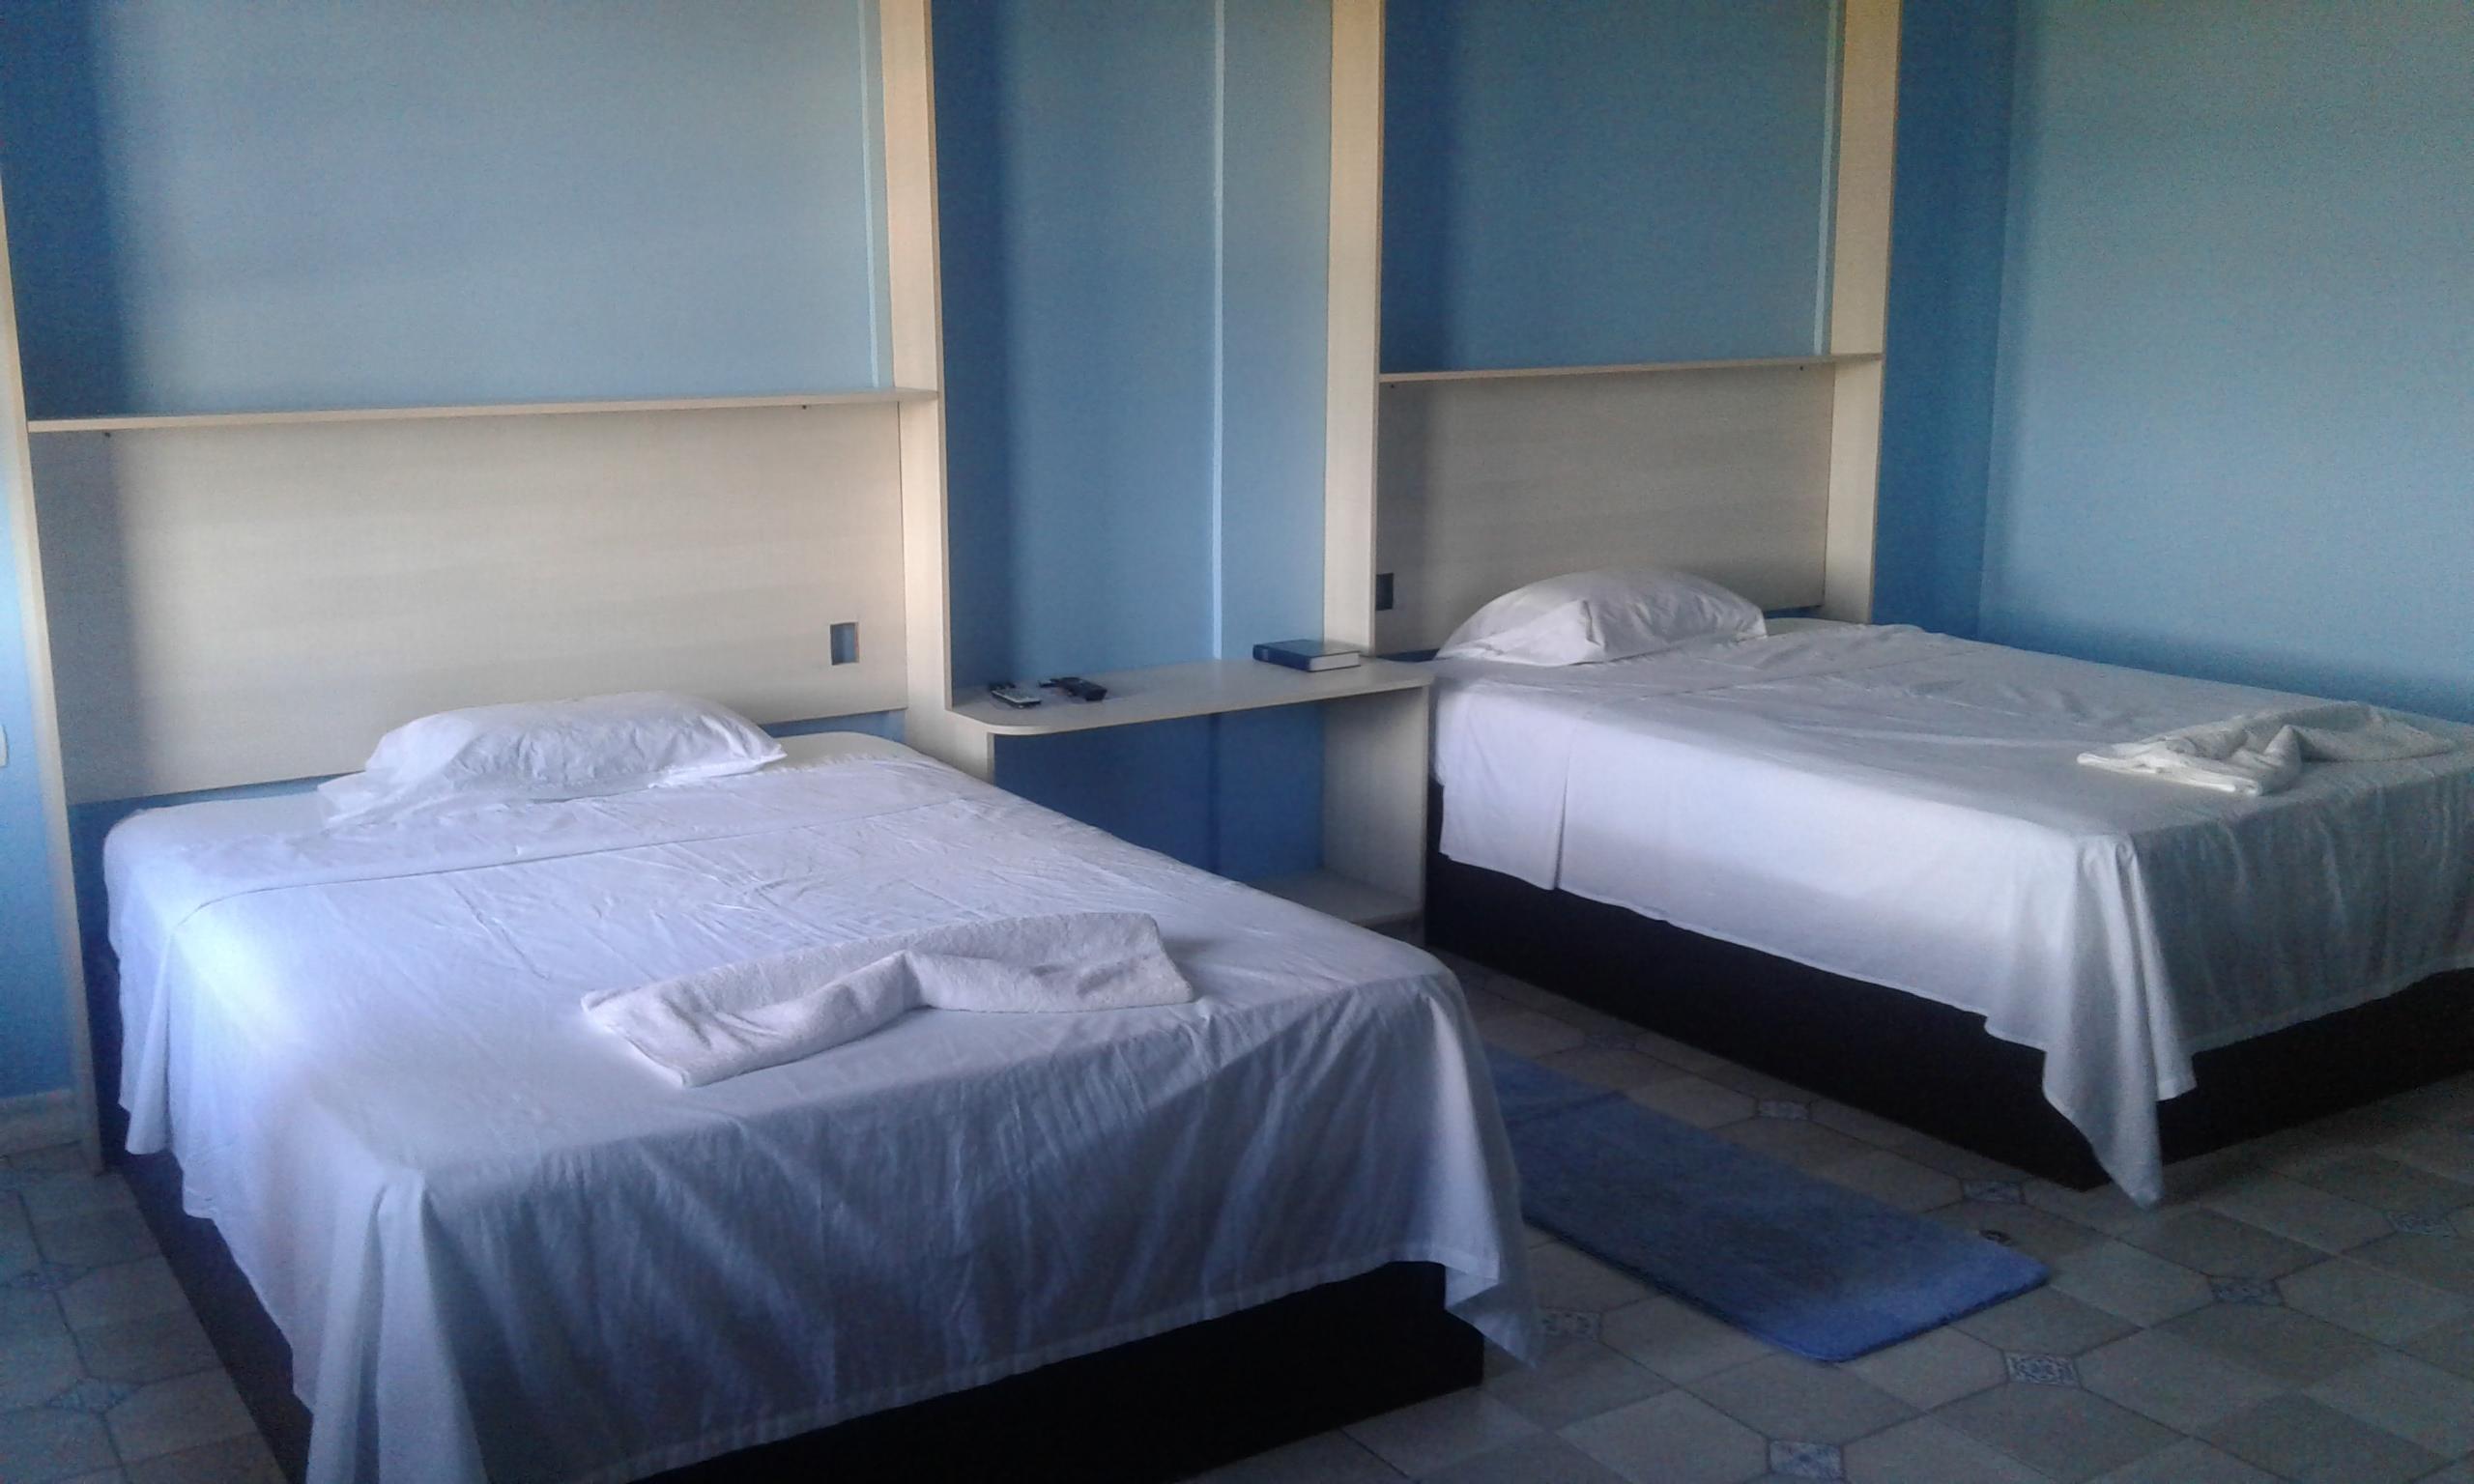 Rupununi Eco Hotel